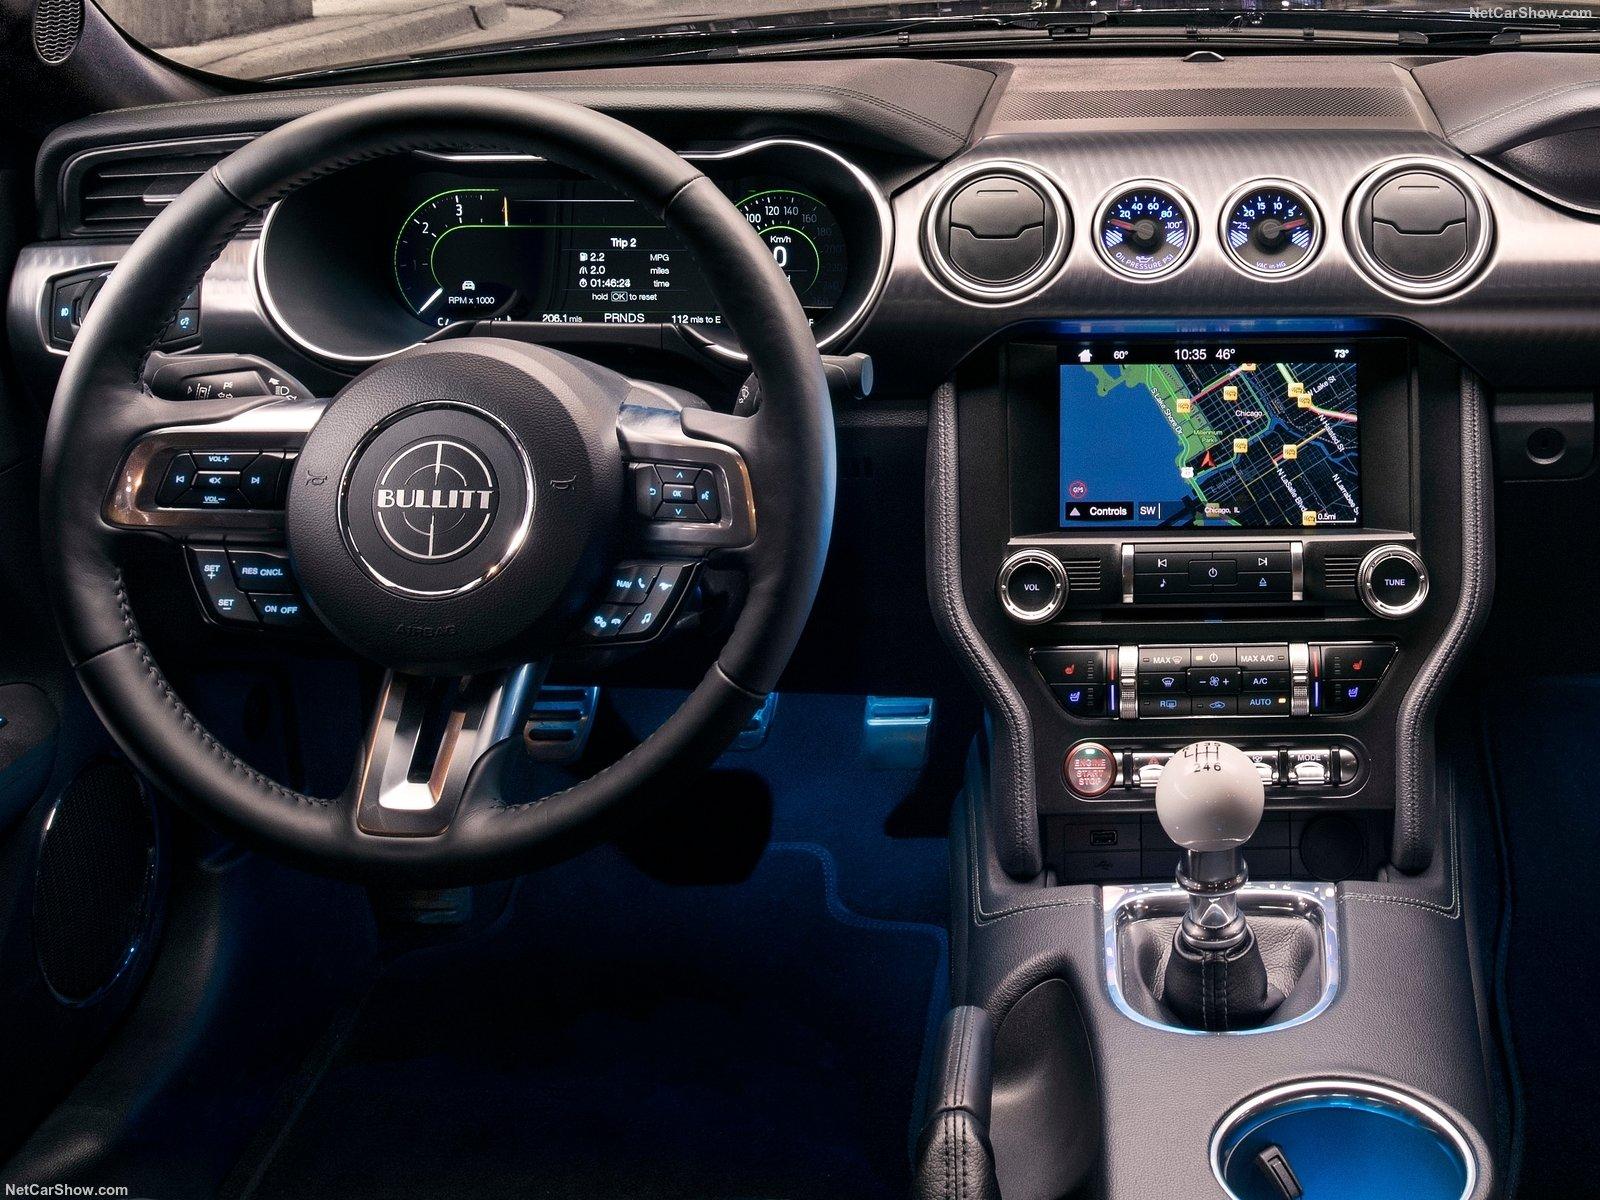 Hintergrundbilder Ford Mustang Bullitt 2019 1600x1200 Ettie03